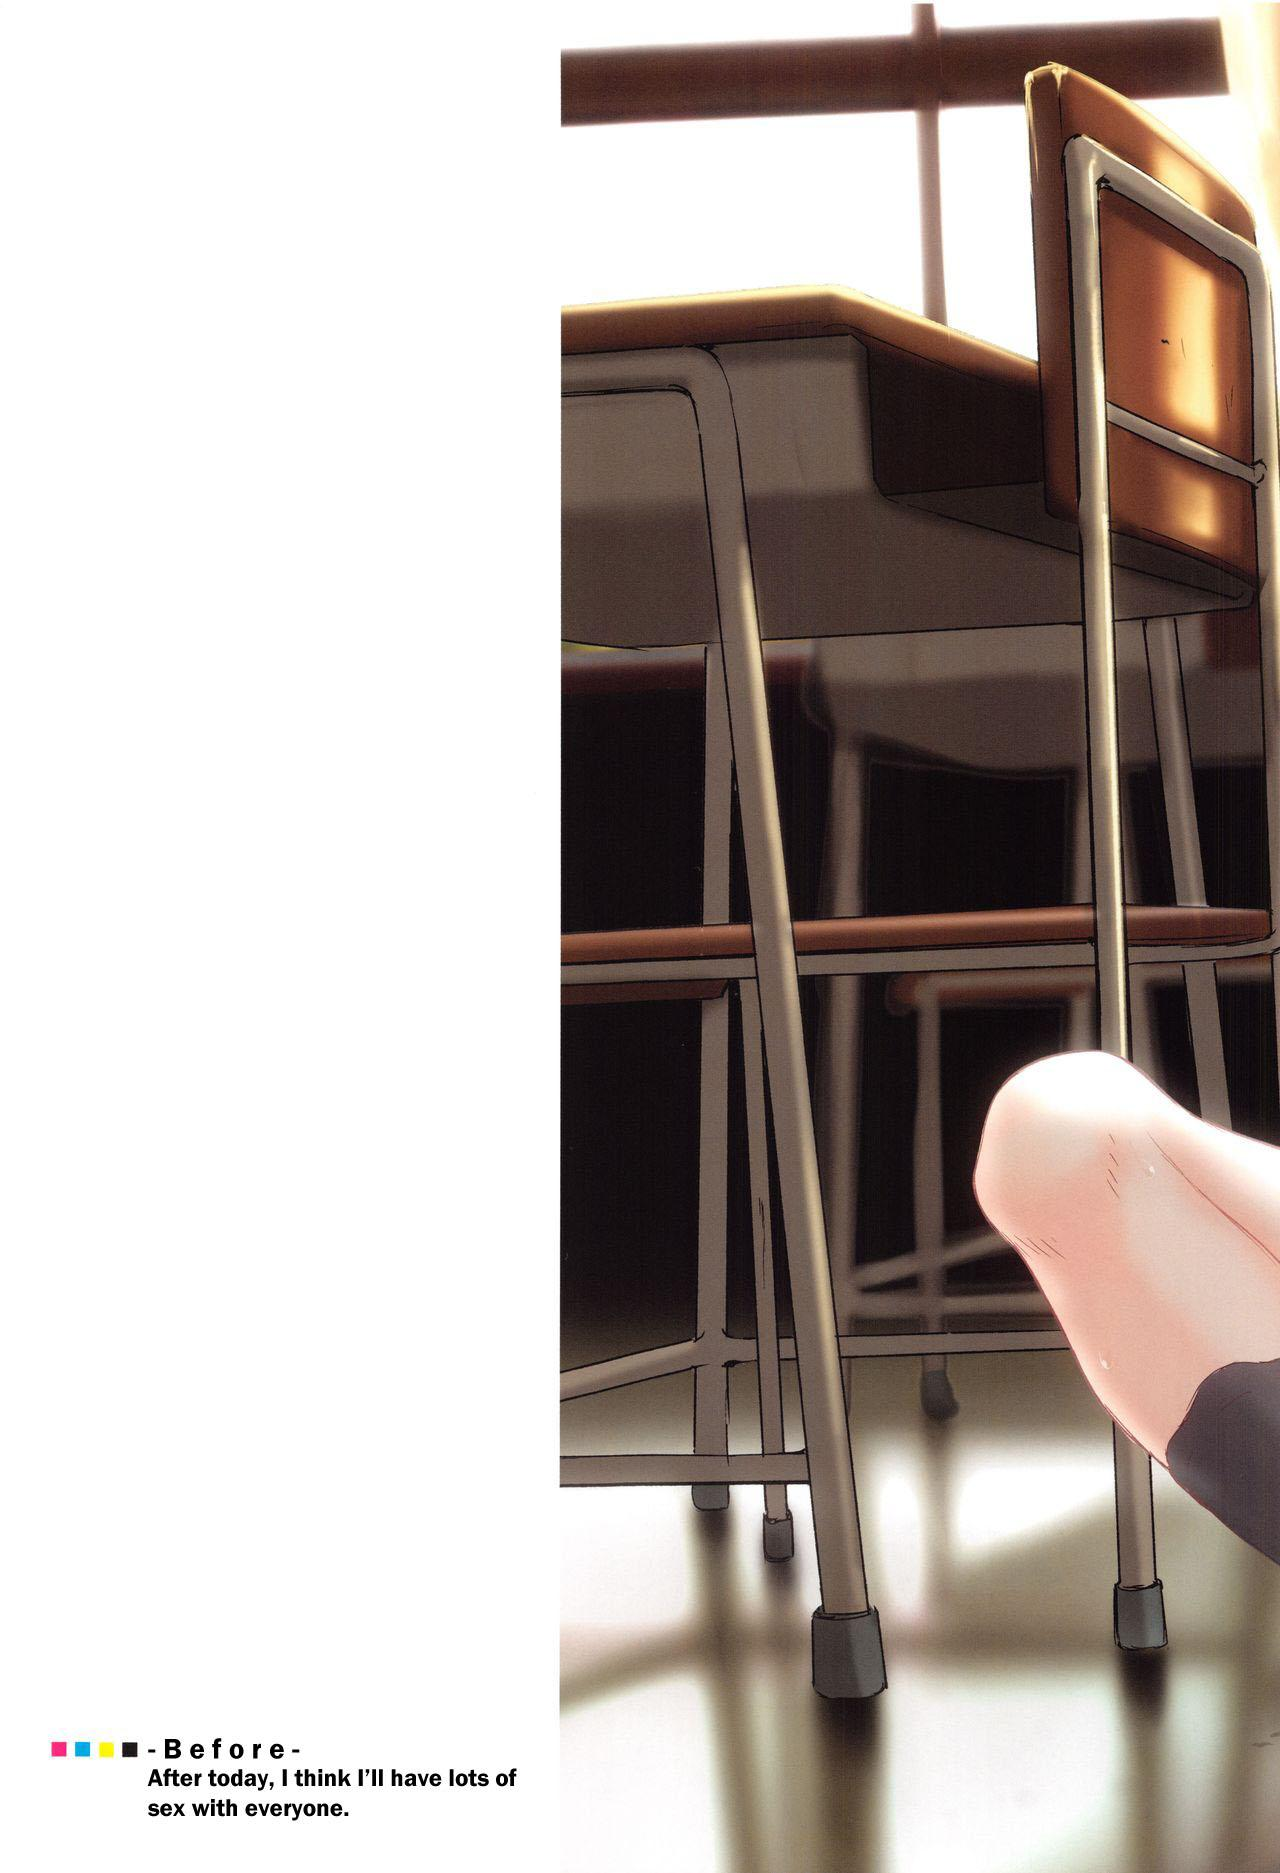 [Peromex (Tamanoi Peromekuri)] ©-sei de Manabu, Tadashii Sex Kouza | JC Hands-On Proper Sex Lecture [English] [bientaimon] [2019-11-09] 29